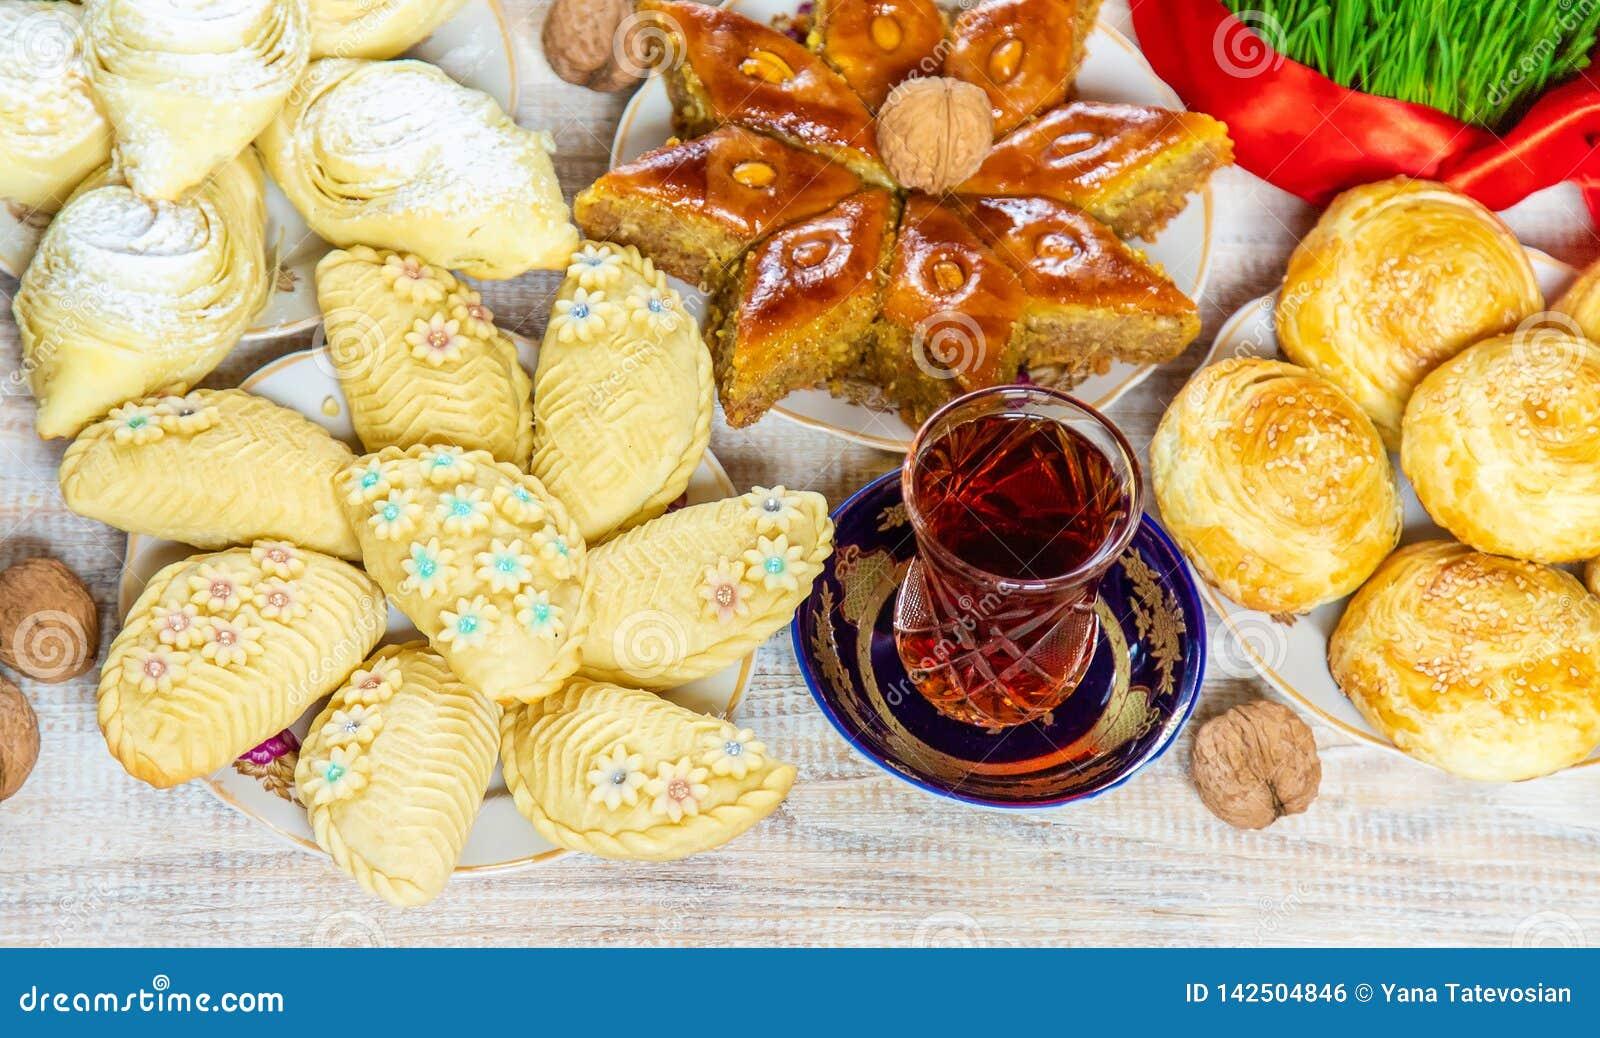 Novruz. Azerbaijani traditions. New Year. Selective focus